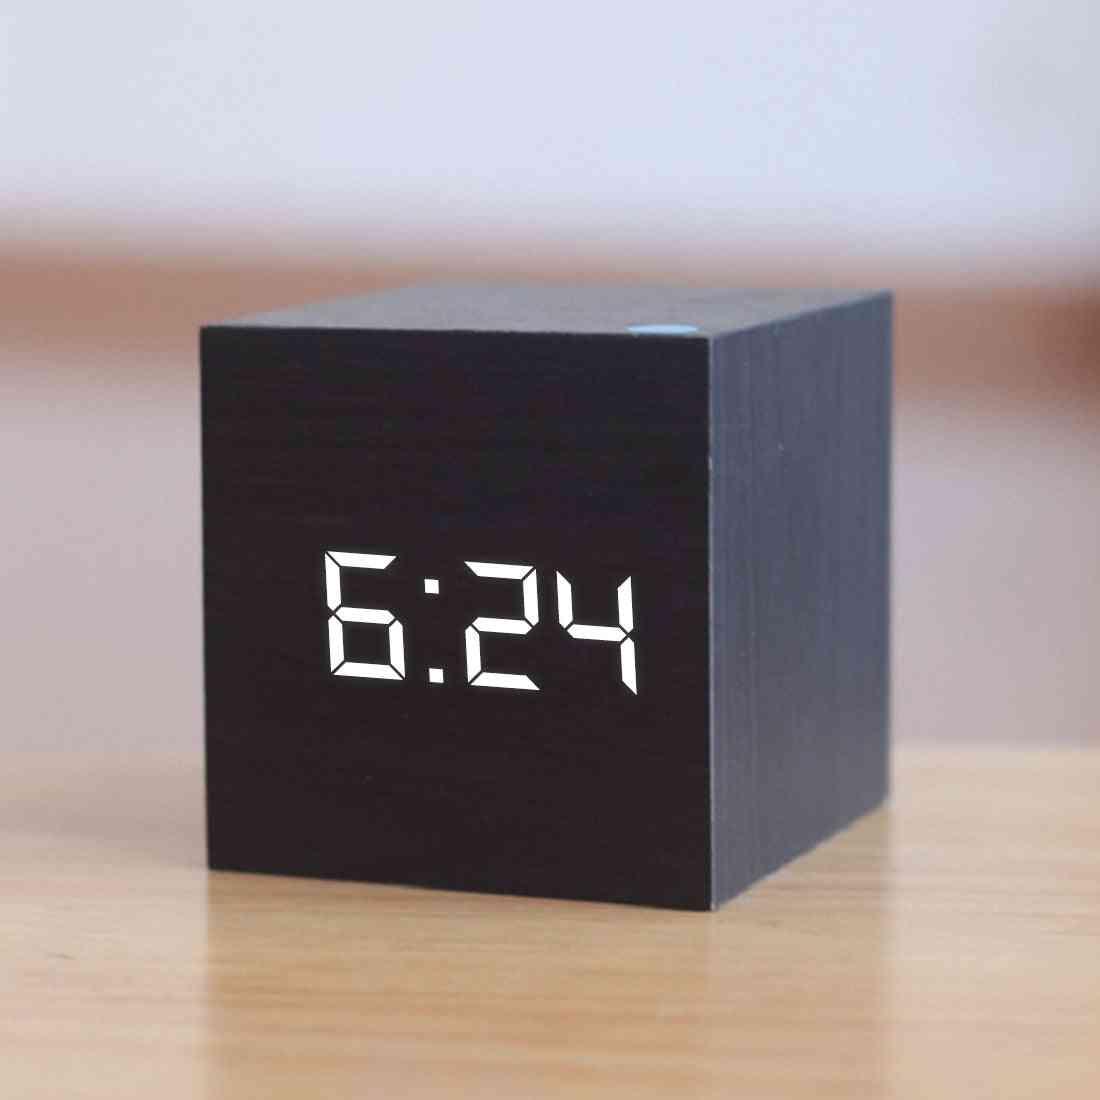 Digital Wooden Led Alarm Clock Retro Glow Clock Desktop Table Decor